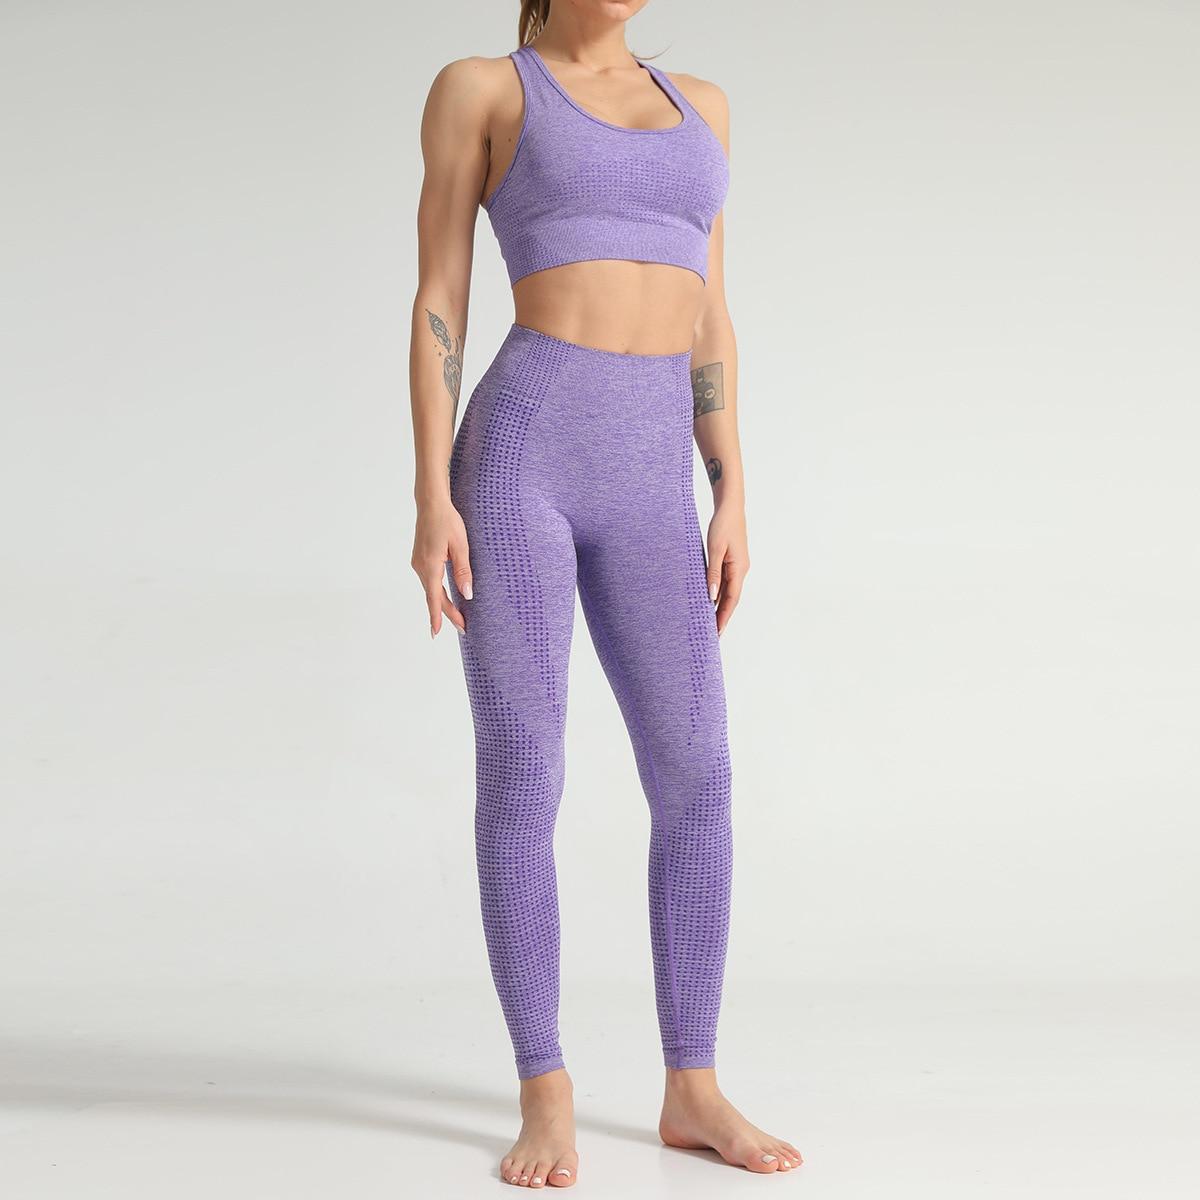 Purple Bra and Pants